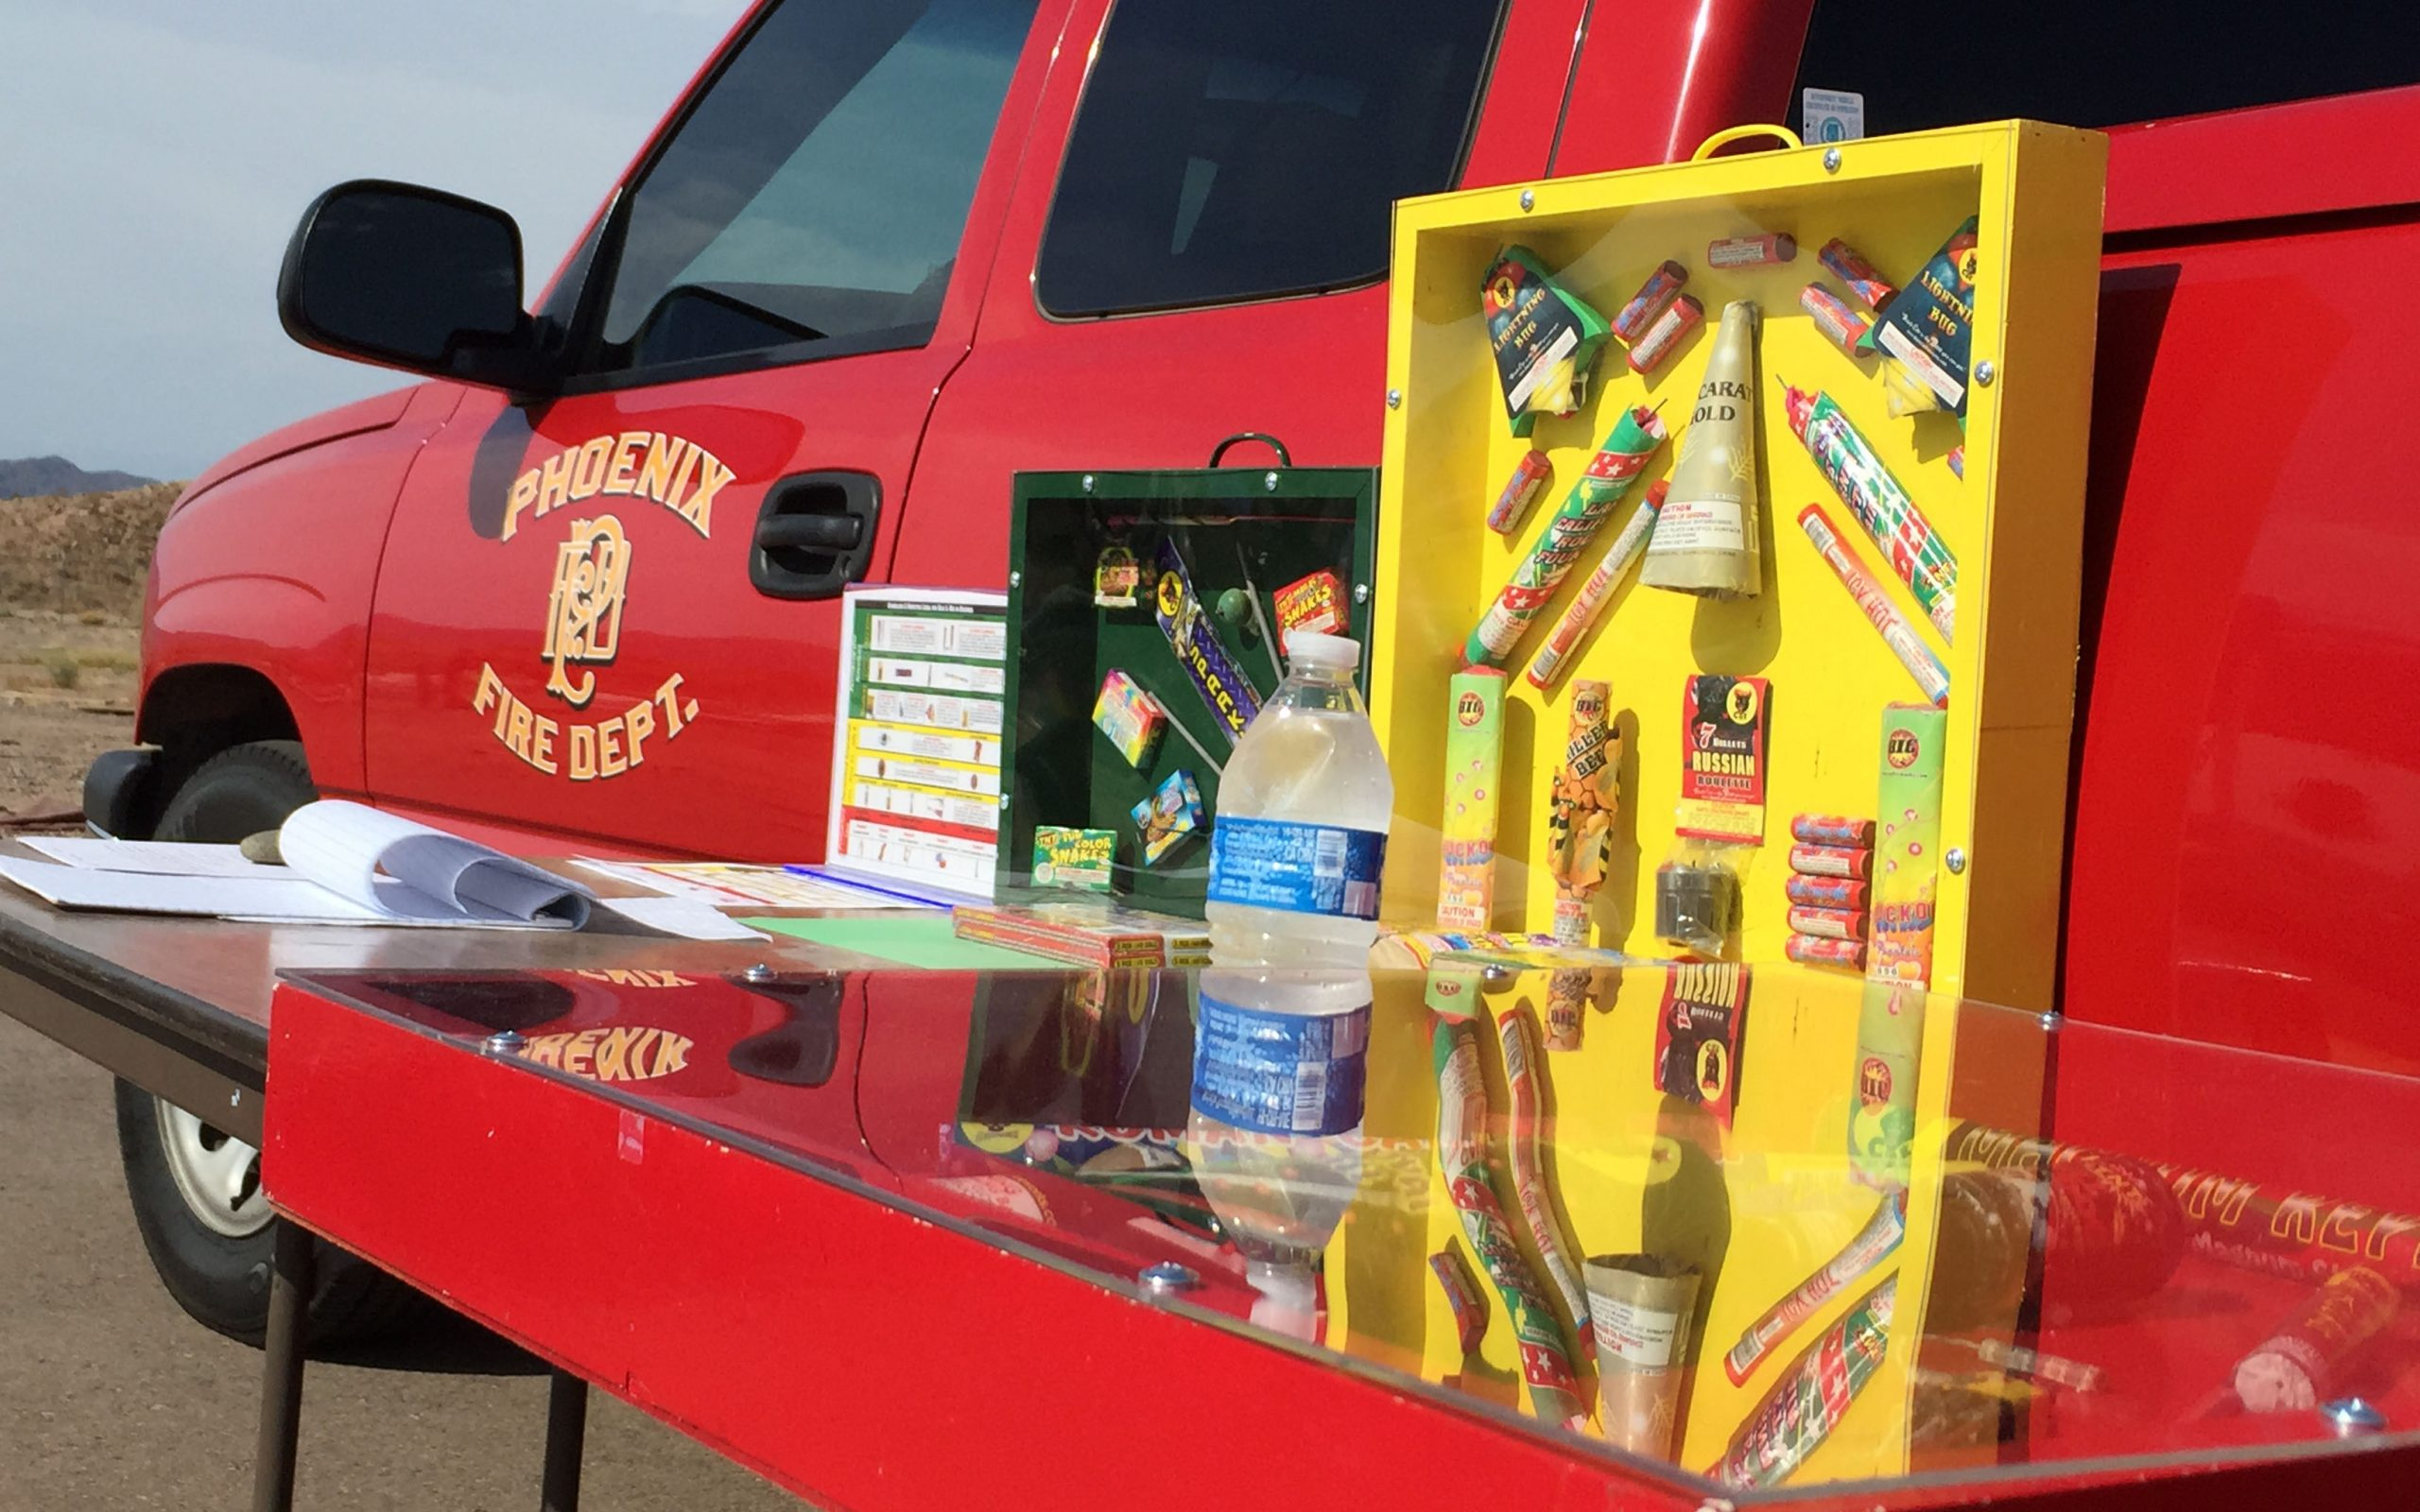 Phoenix Fire Department truck photo